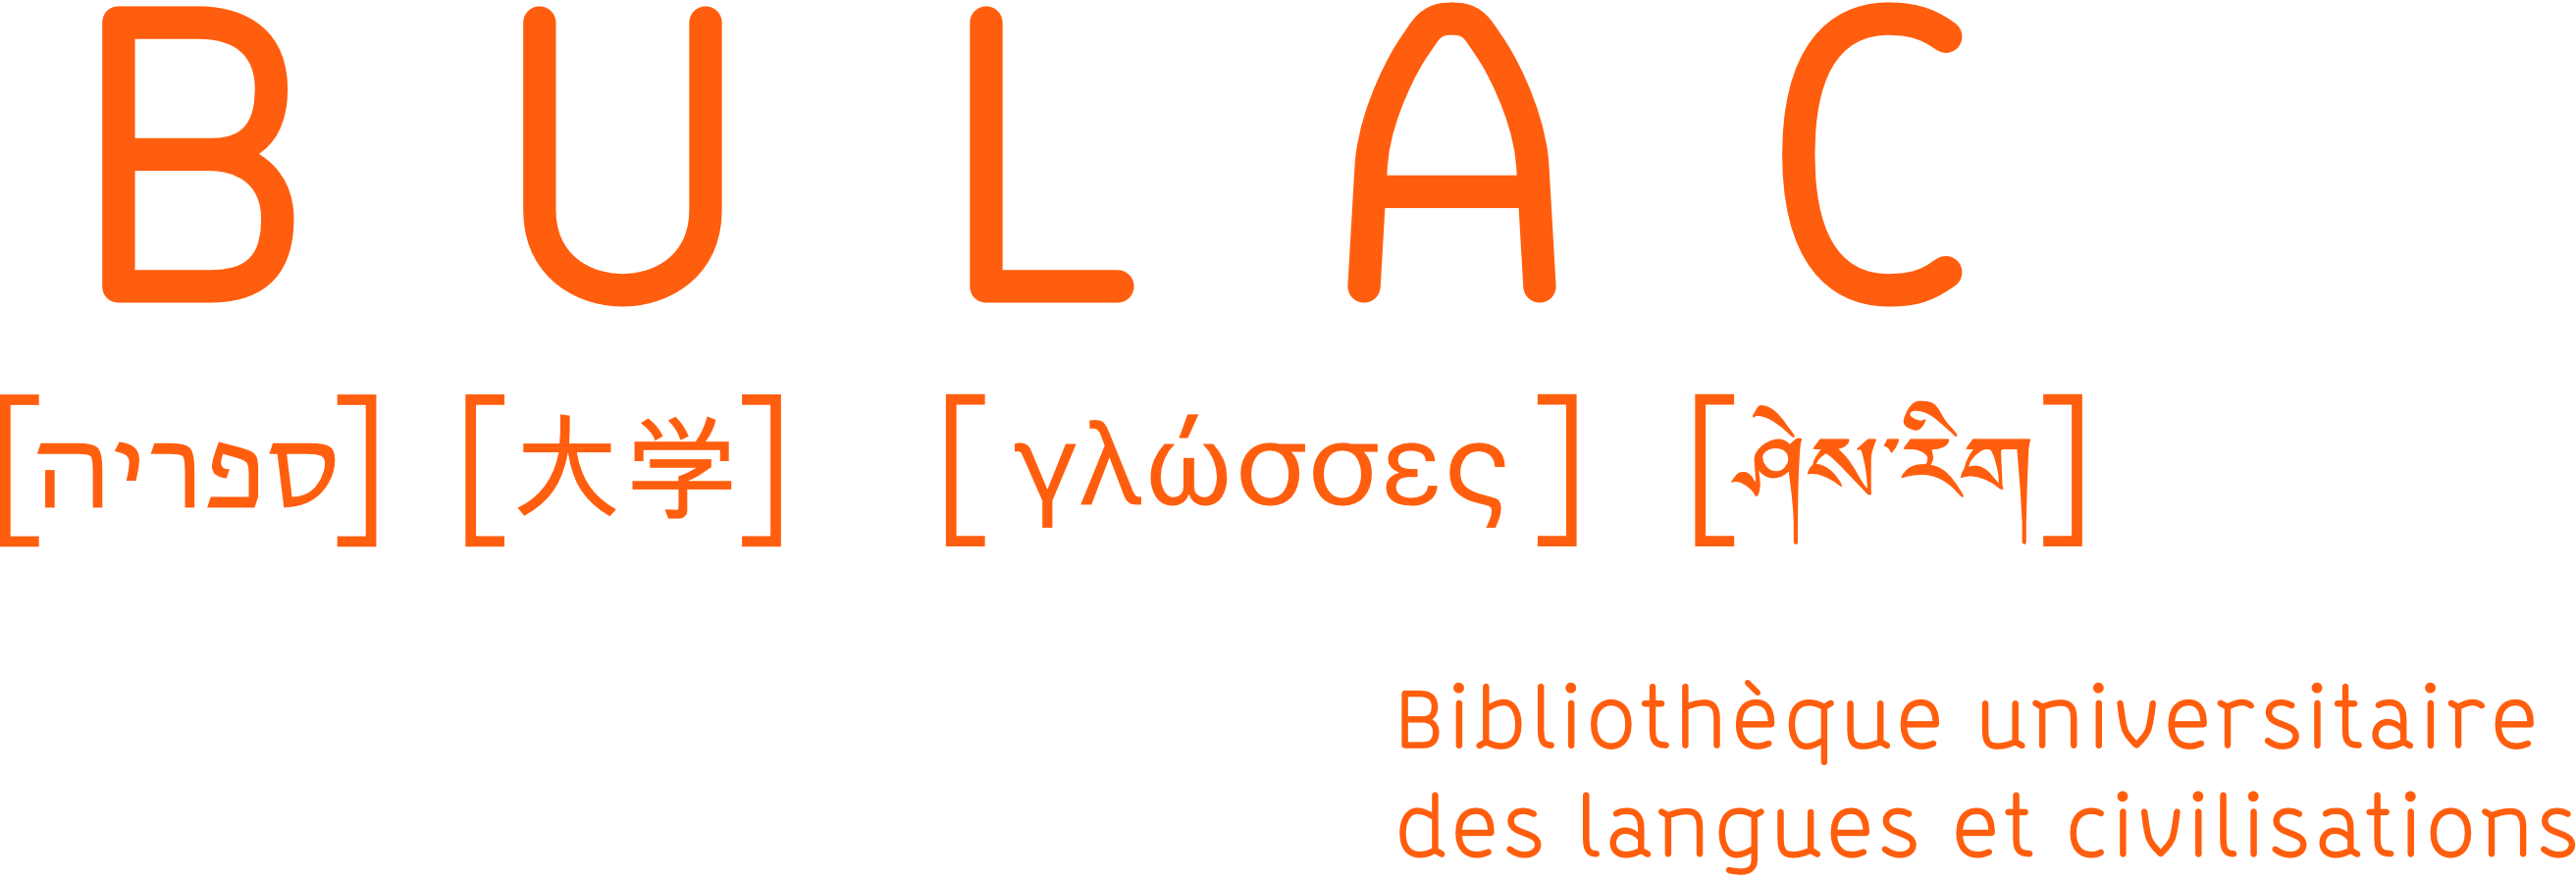 https://upload.wikimedia.org/wikipedia/commons/0/0d/Logo_BULAC.png